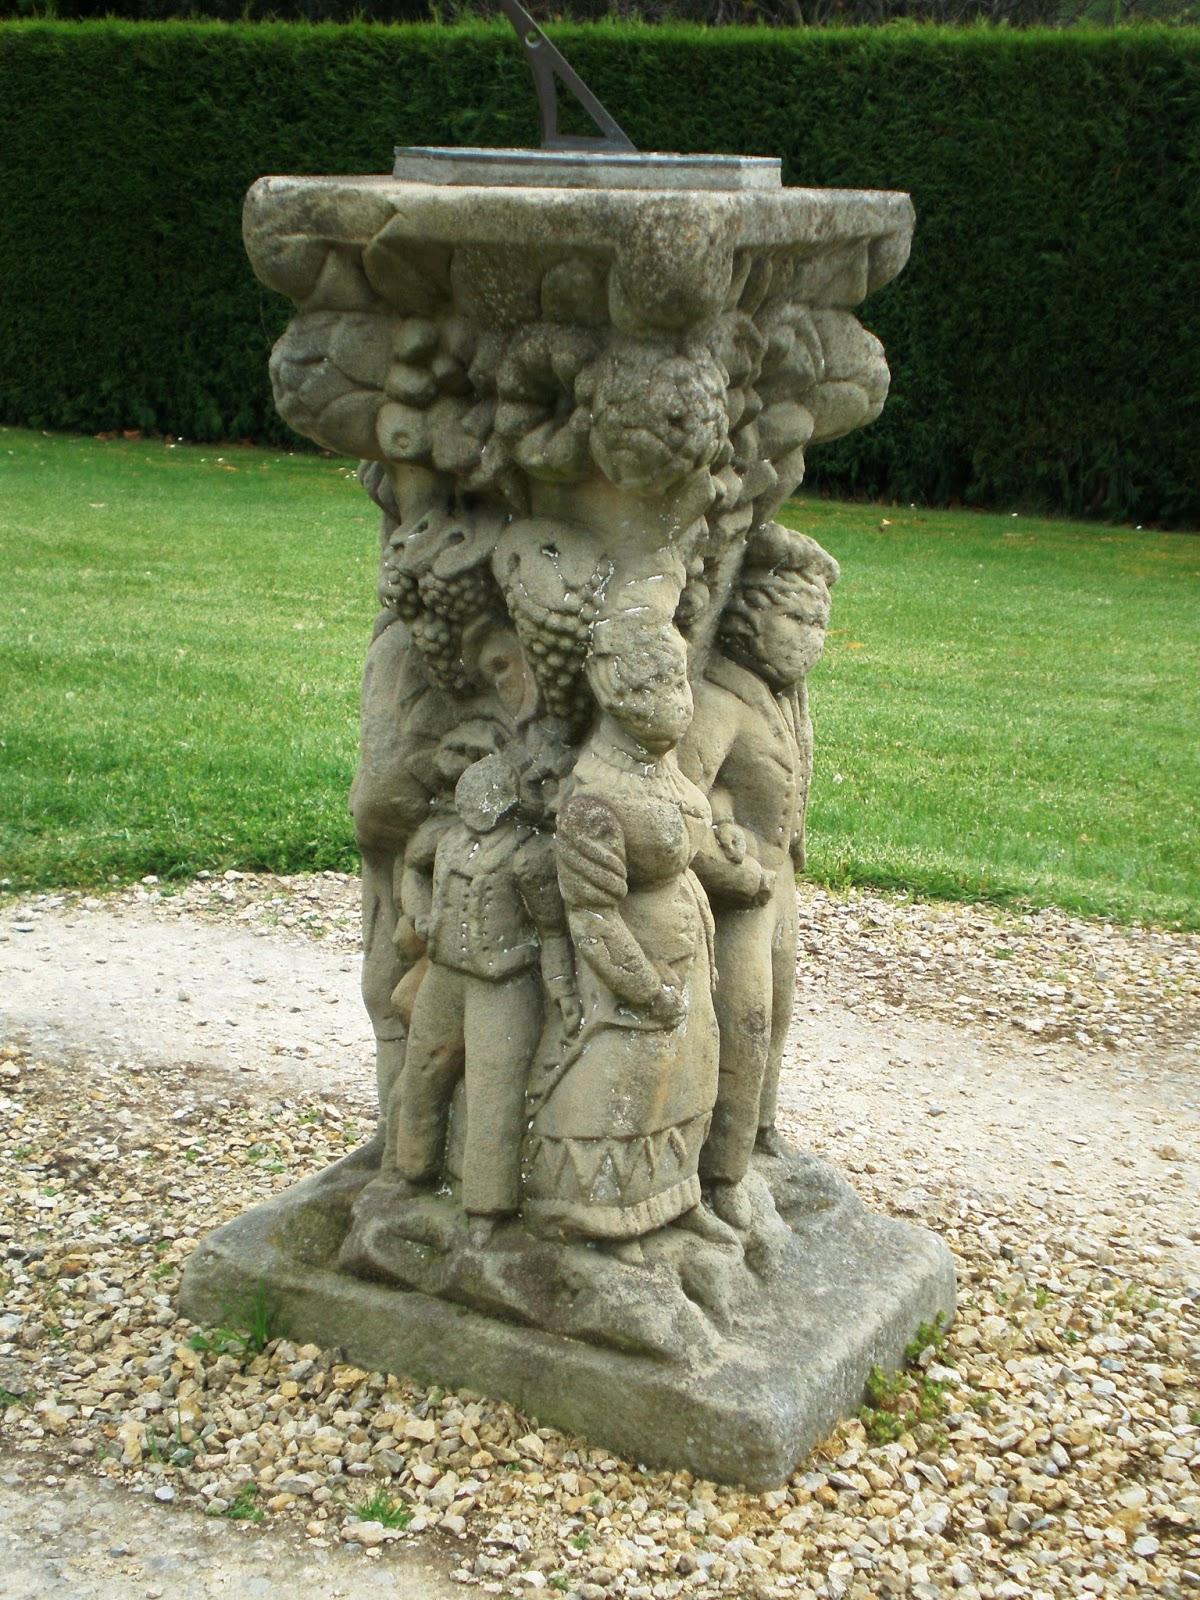 stone roman shop s sun sundial aged dial pedestal garden brass